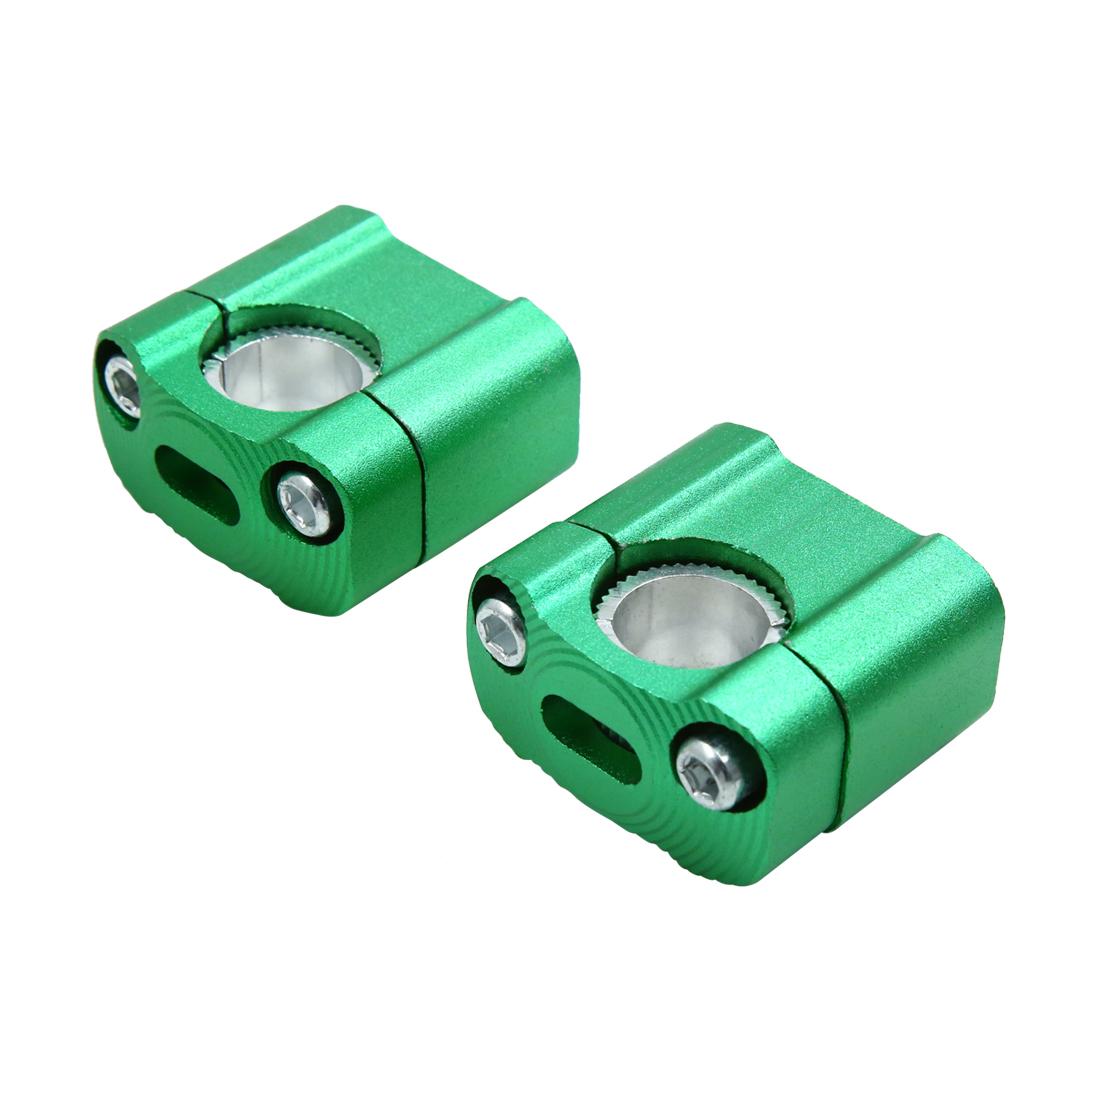 2Pcs Universal Green 28mm Handlebar Riser Clamp Bracket Adaptor for Motorcycle